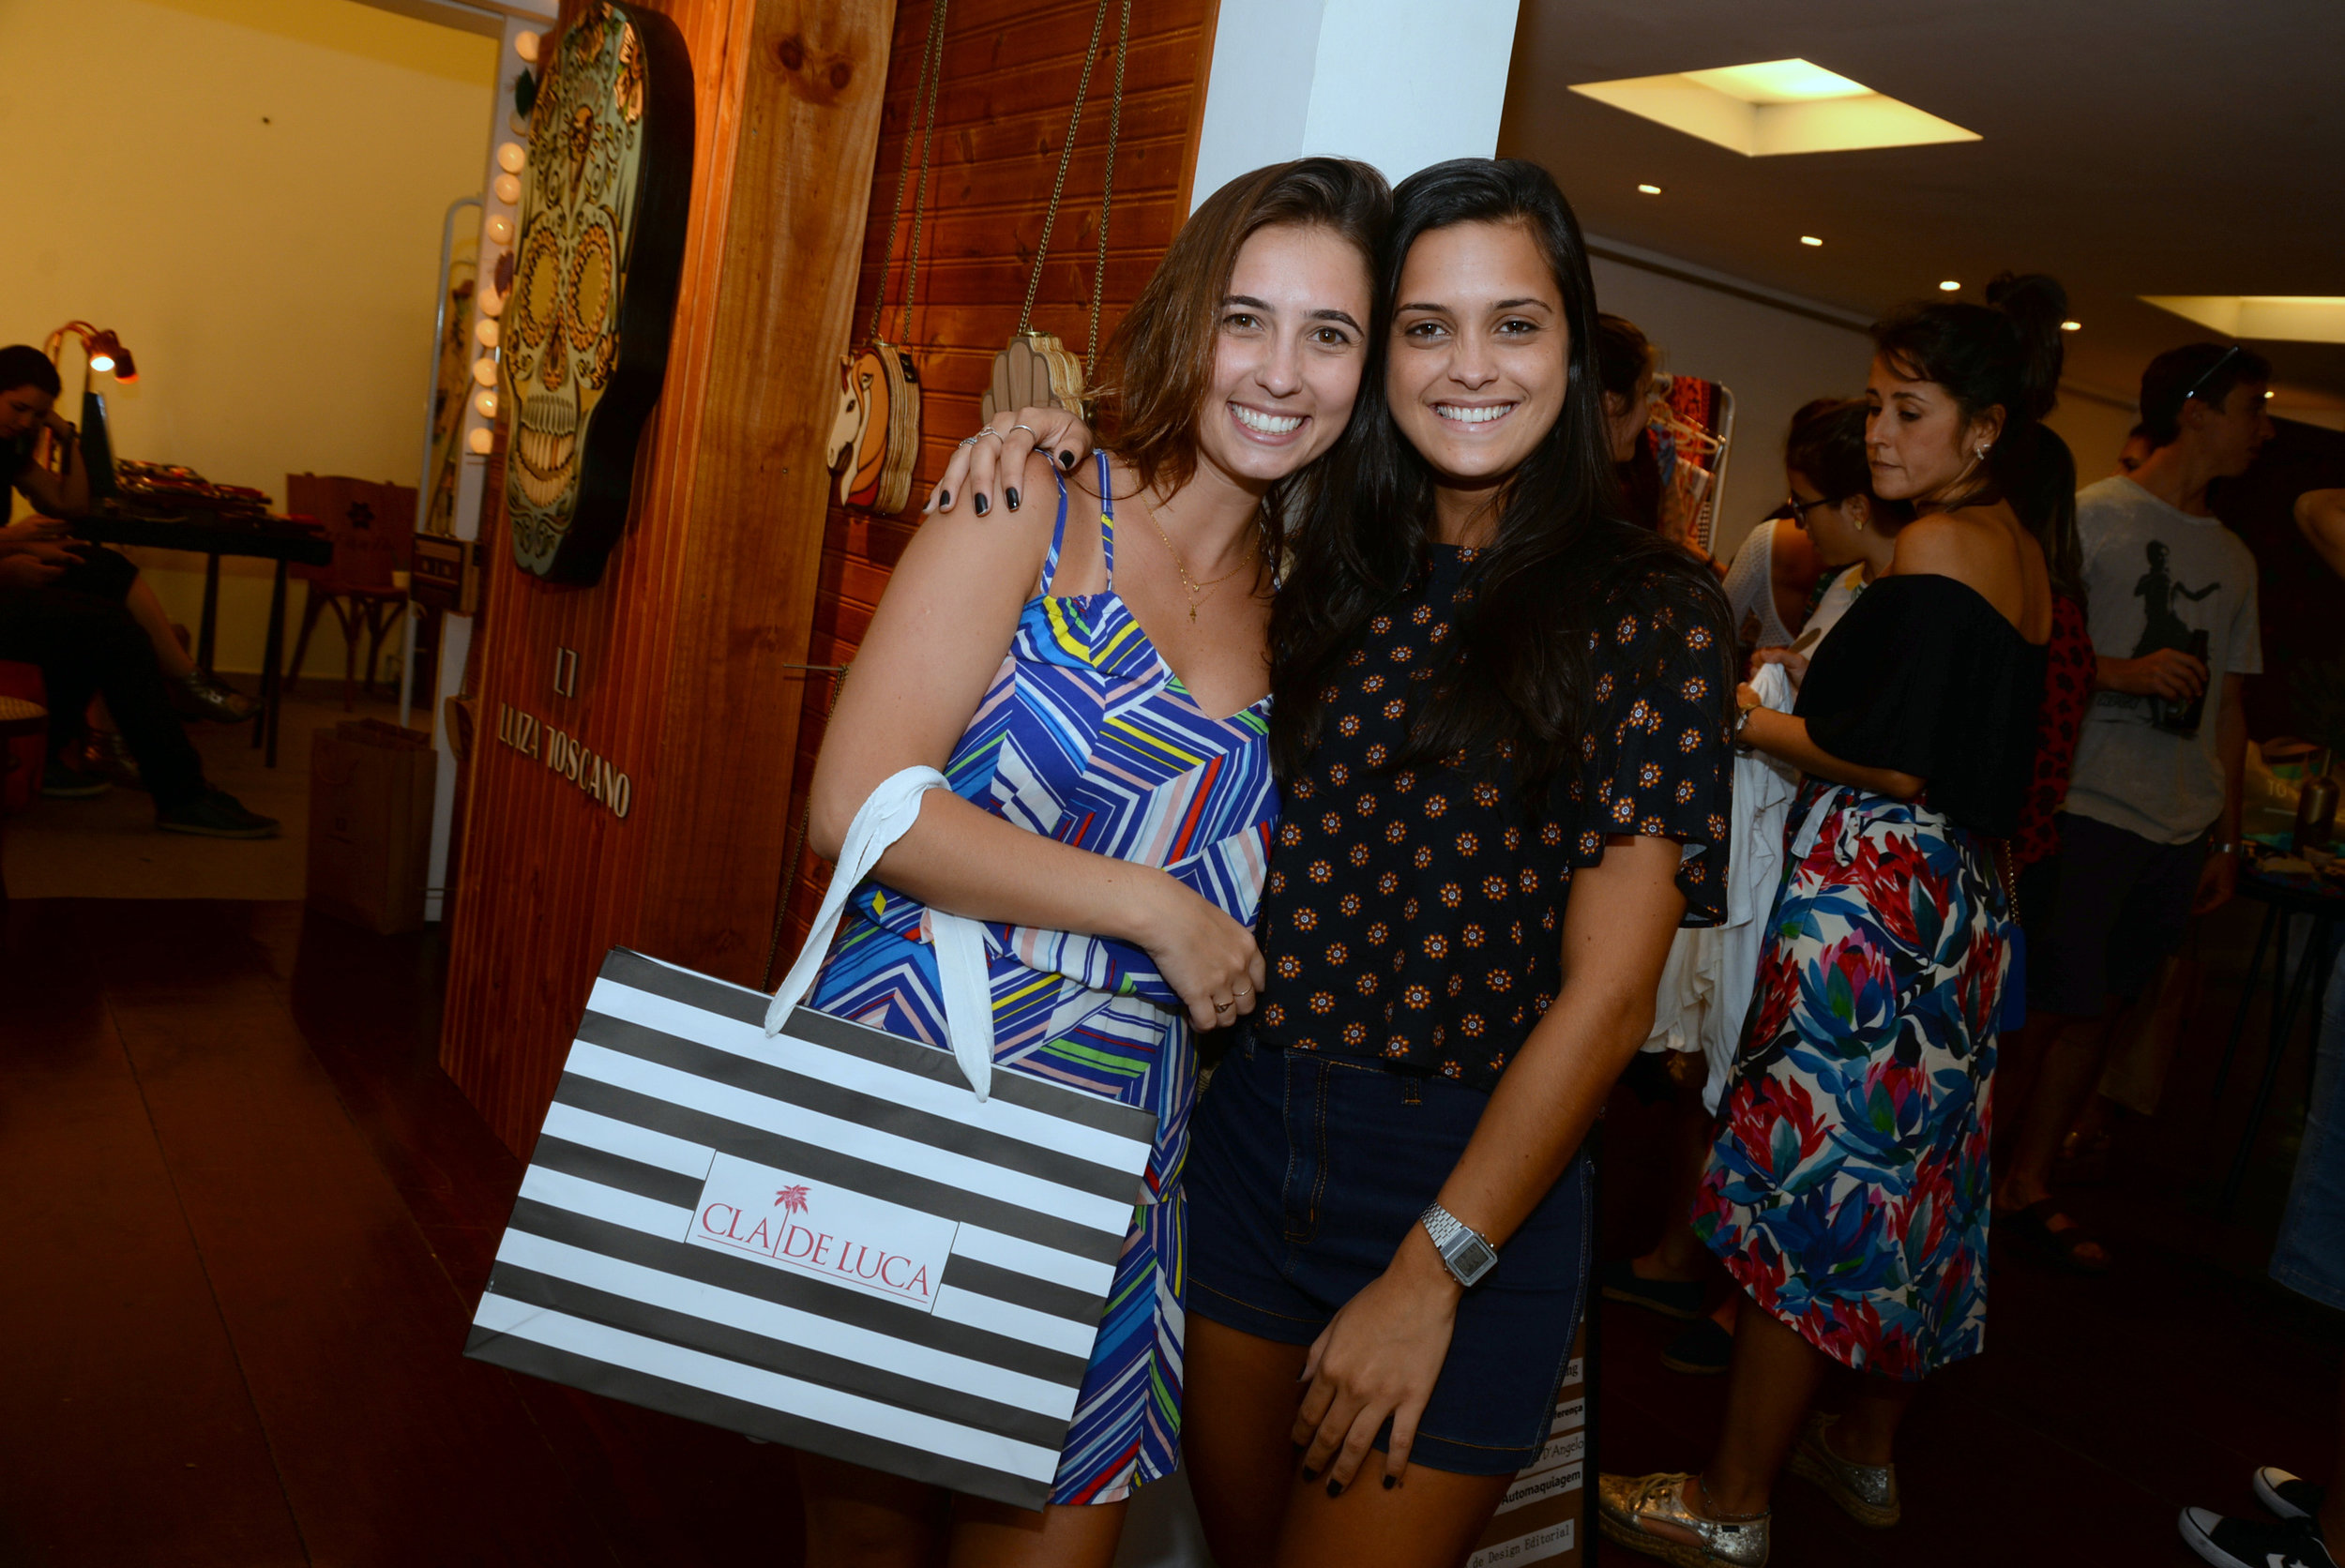 Vanessa Pereira e Luiza Leal.JPG